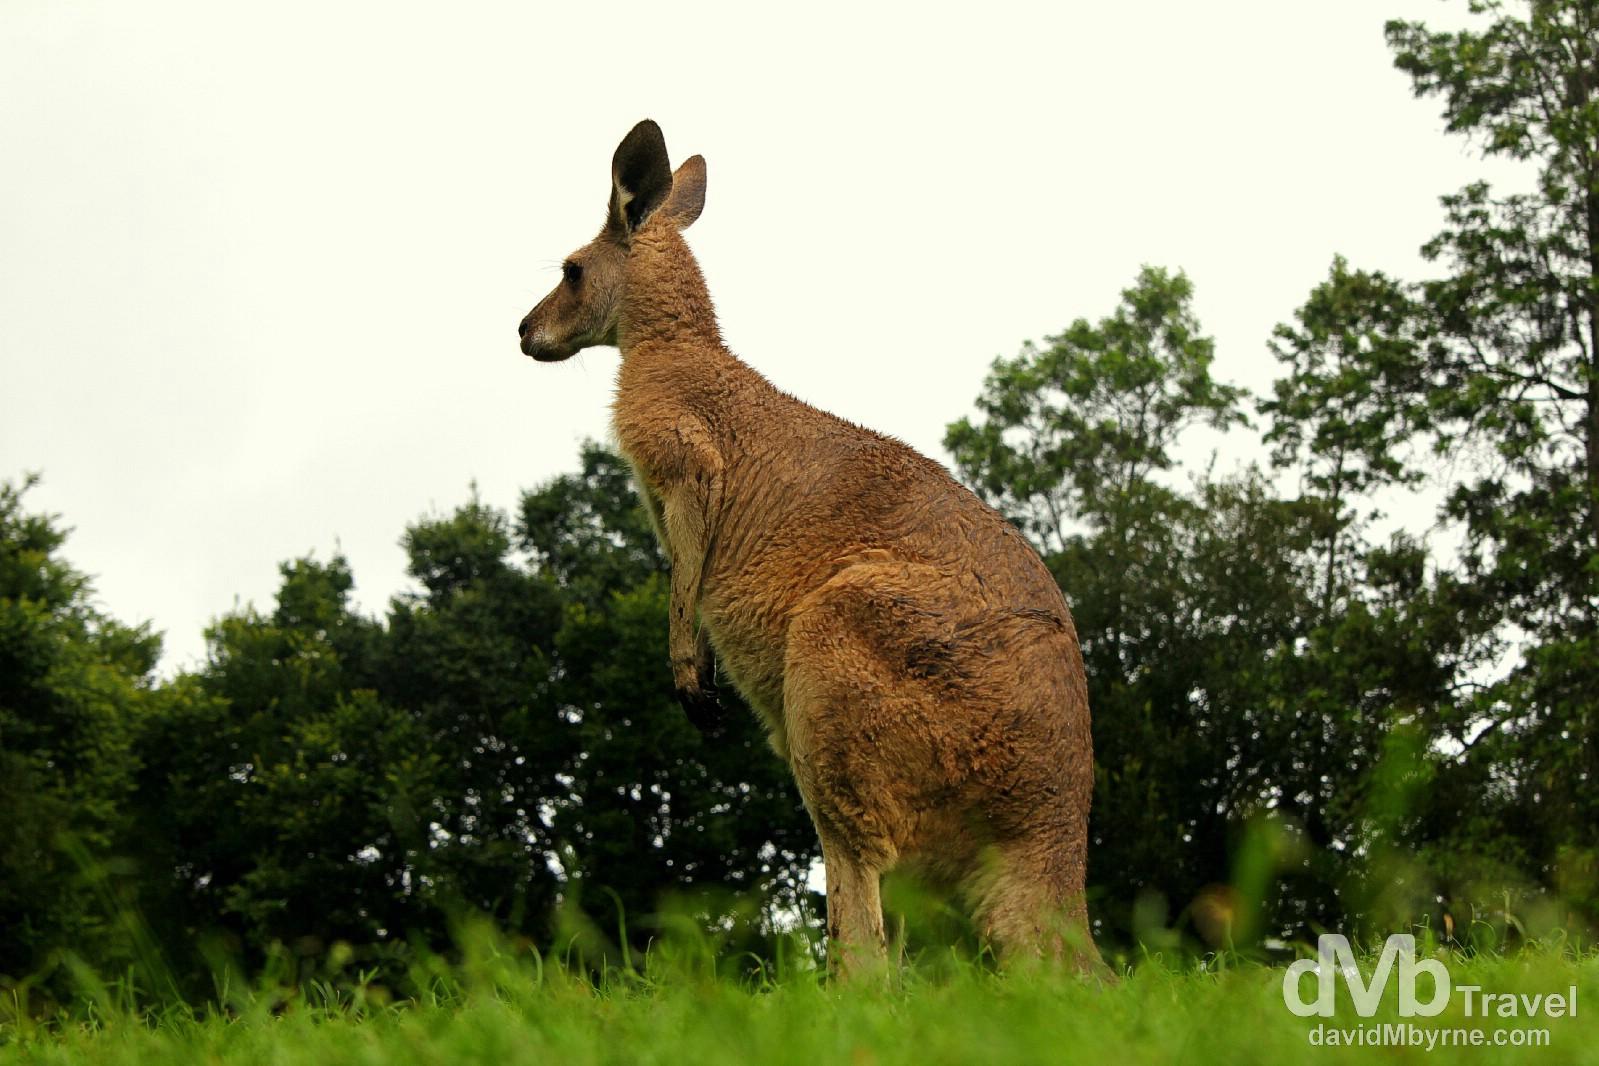 A kangaroo in Lone Pine Koala Sanctuary, Brisbane, Queensland, Australia. April 15th 2012.